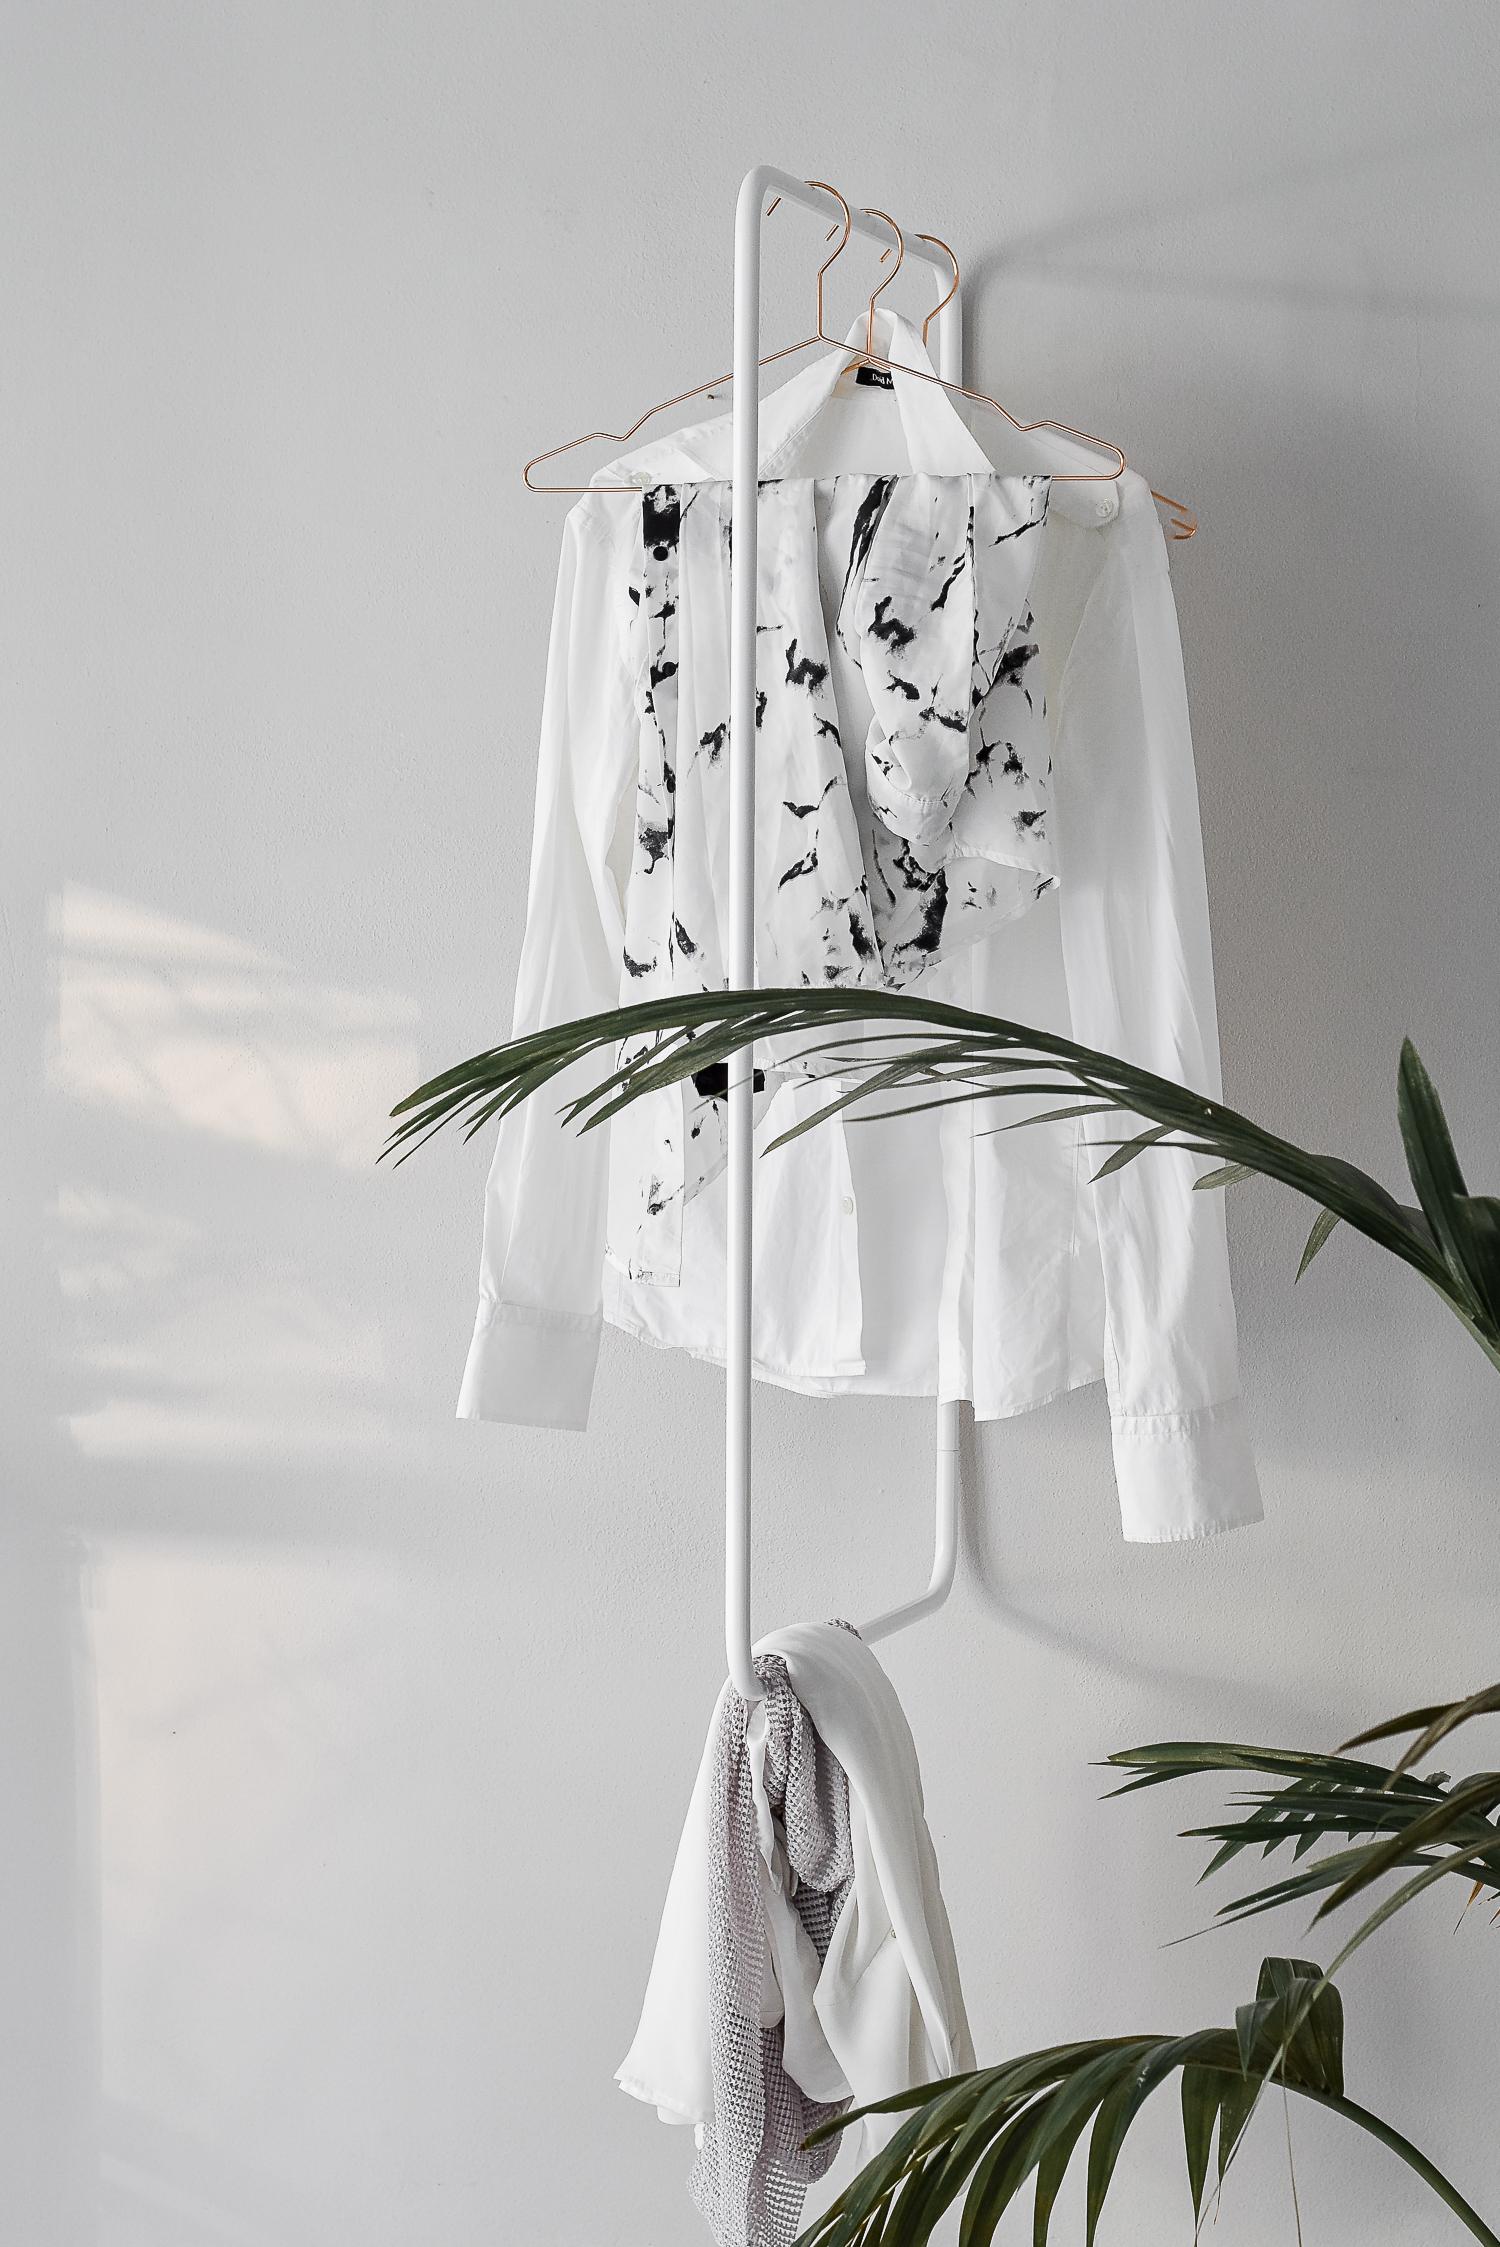 wardrobe turnaround rack